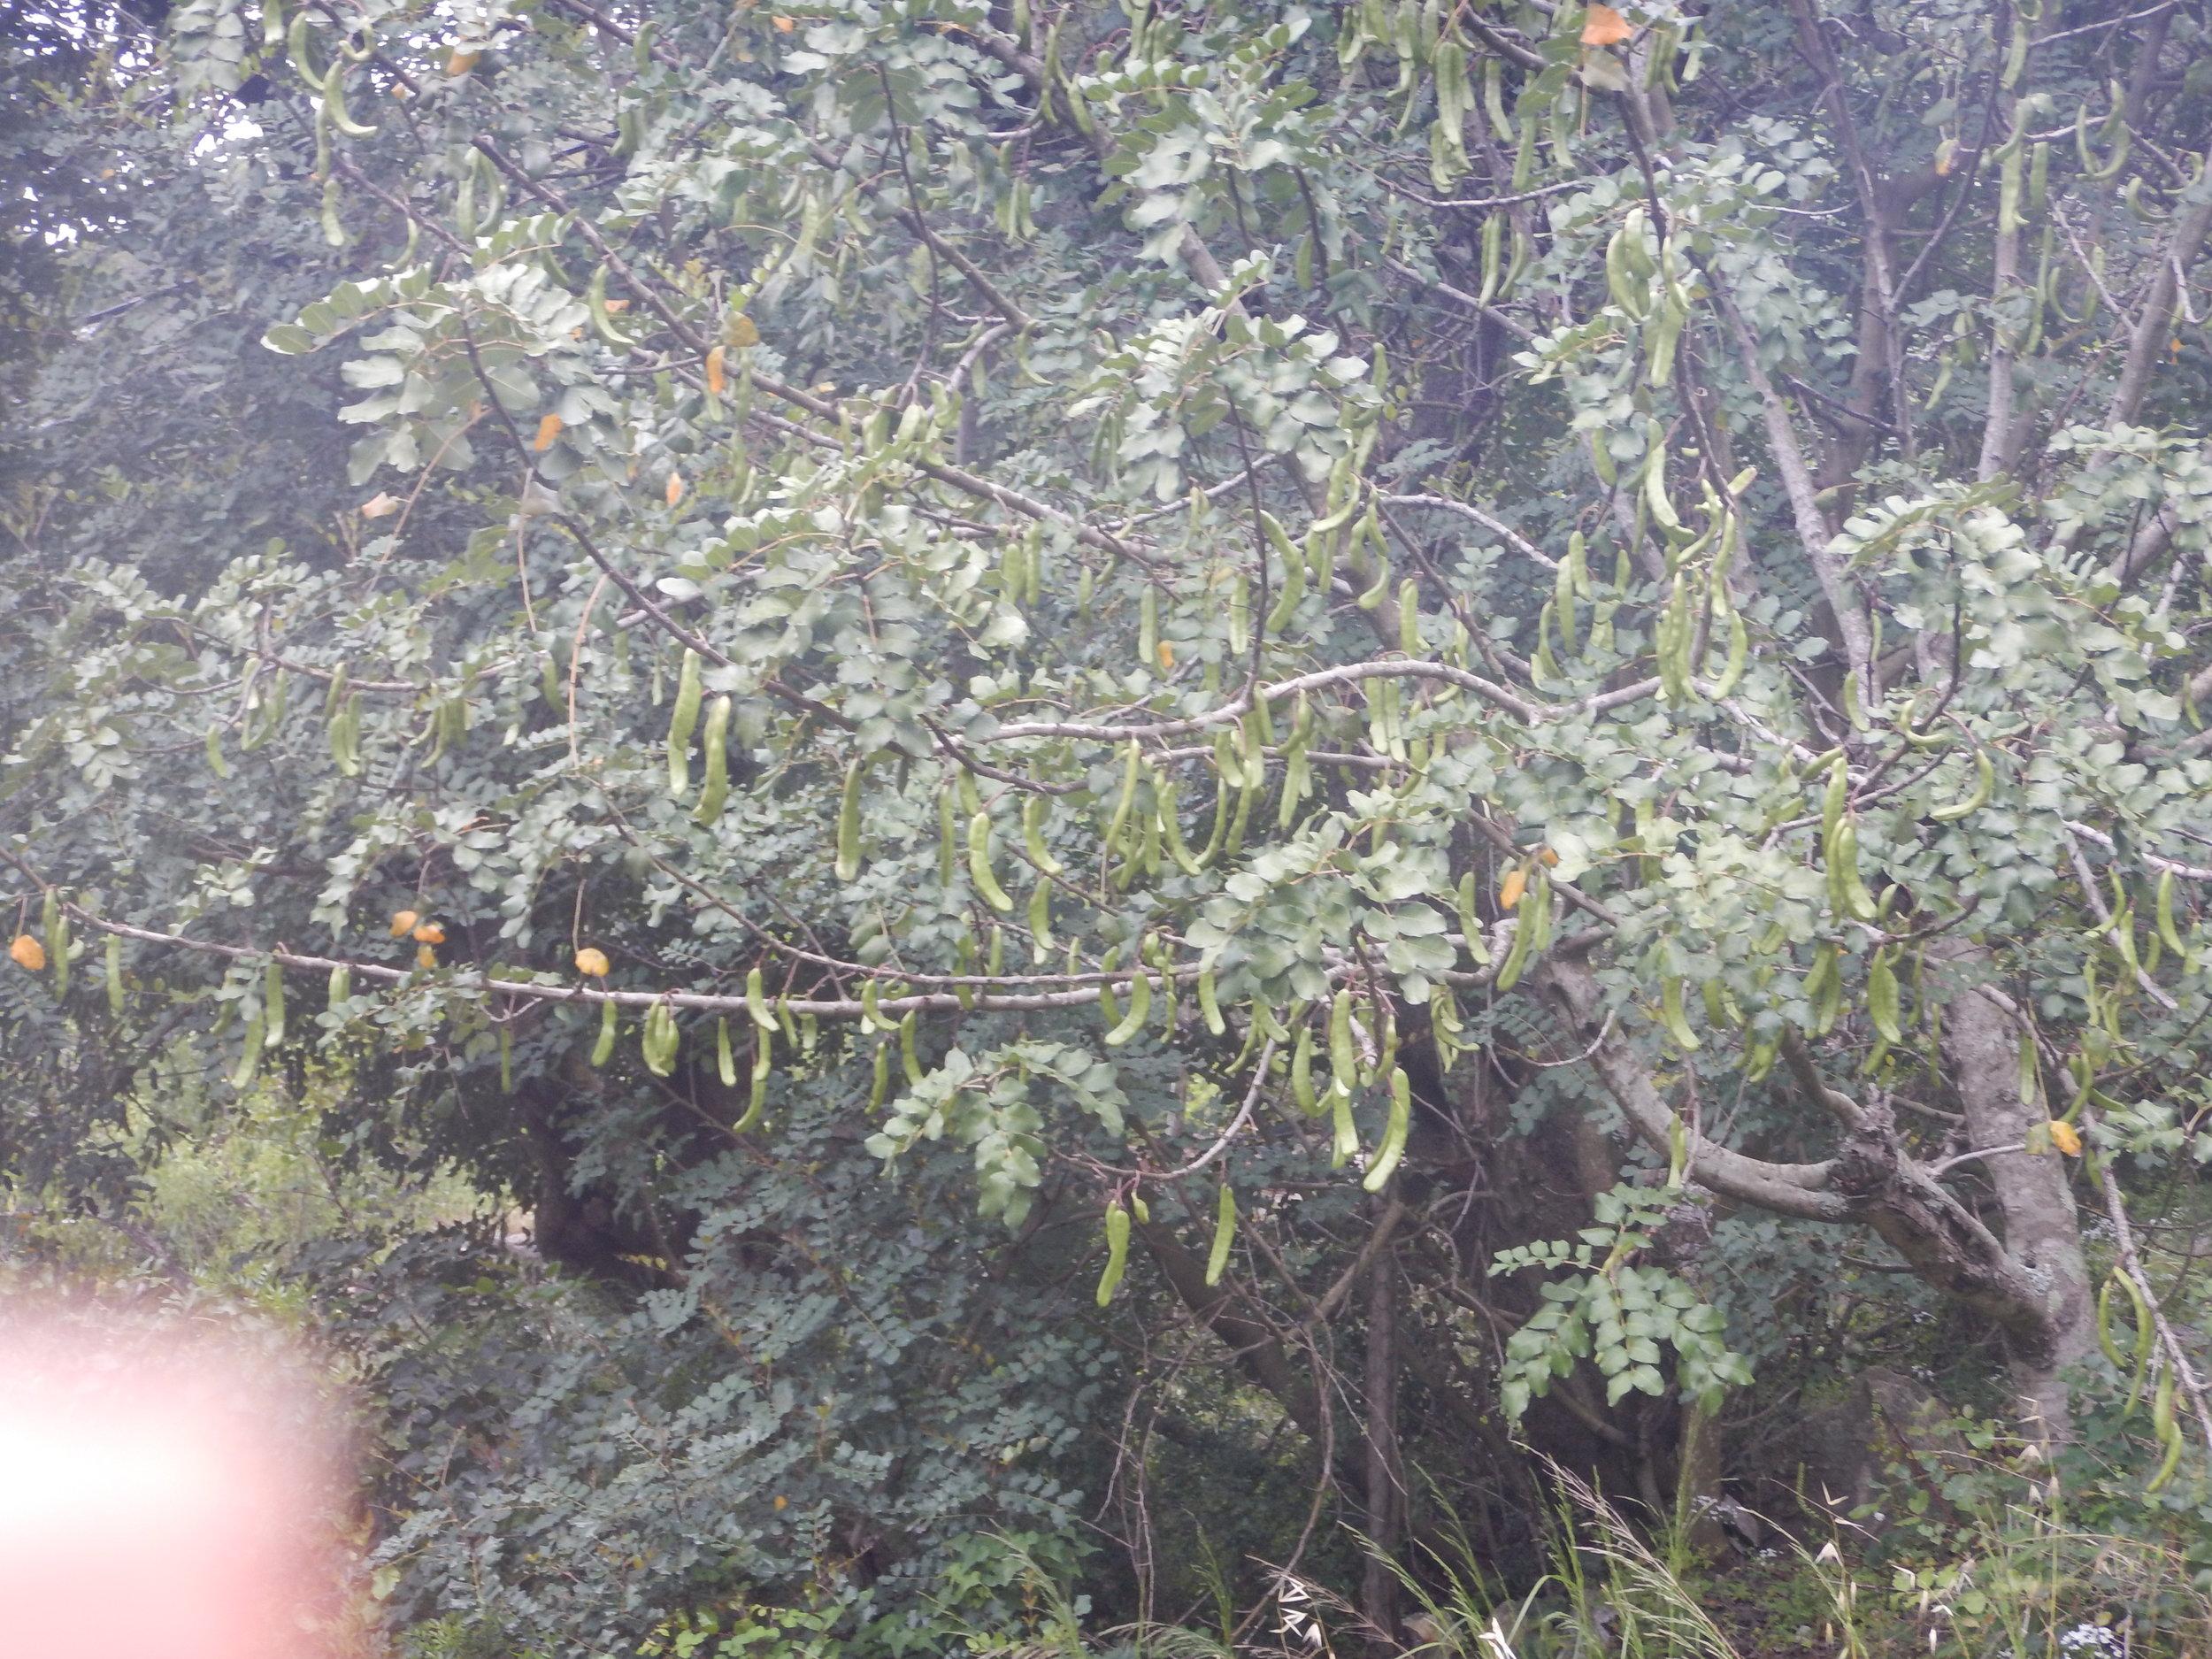 Rogac tree, a Savoury vegetable eaten when ripe in September.